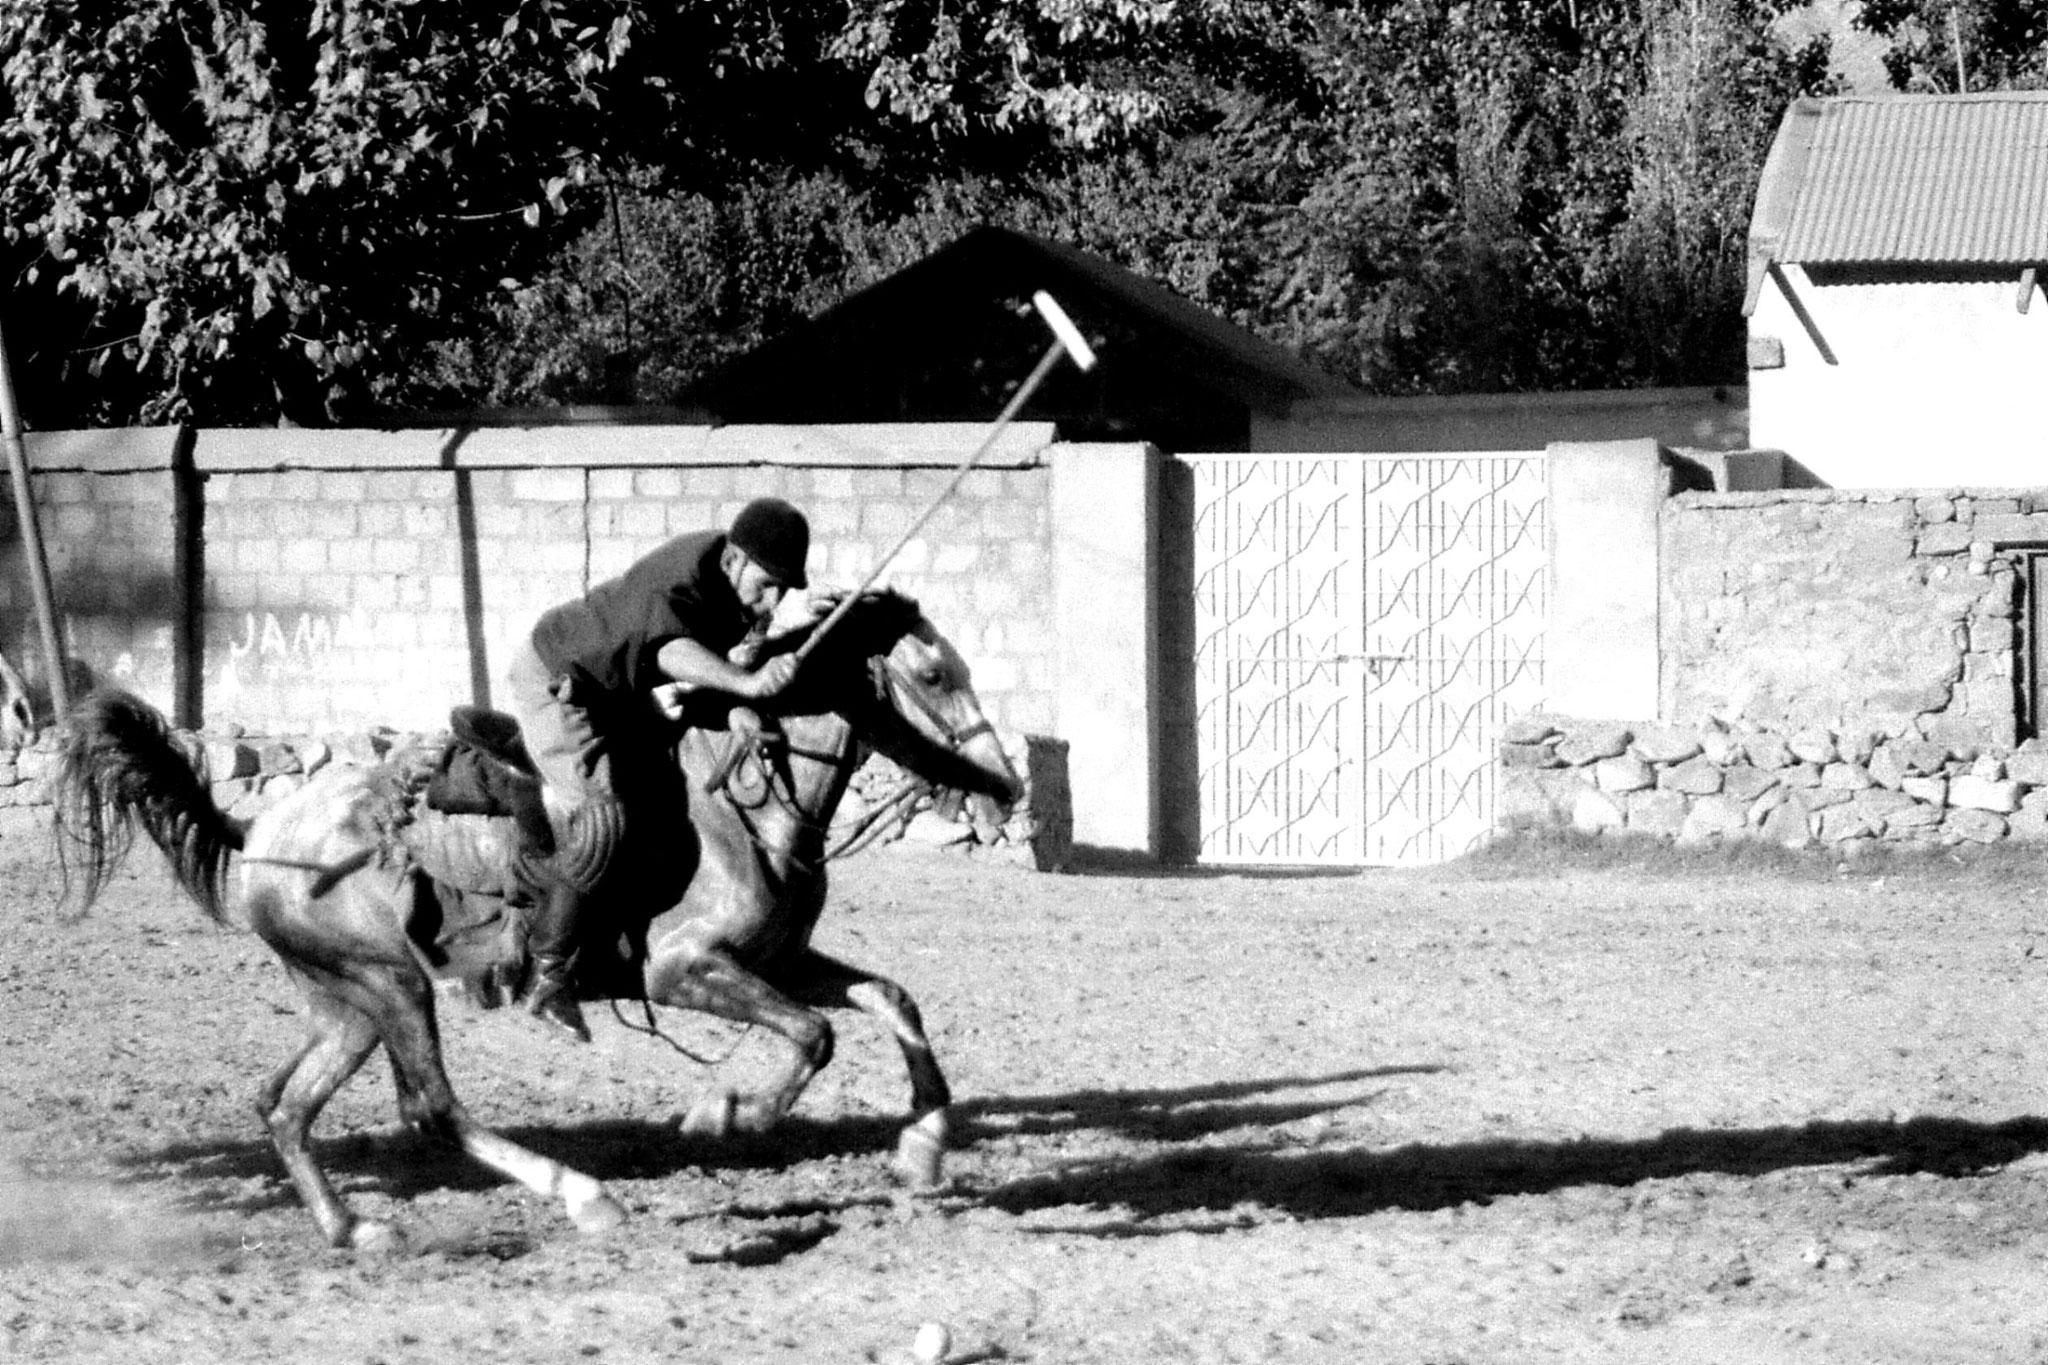 9/10/1989: 6: Gilgit polo match